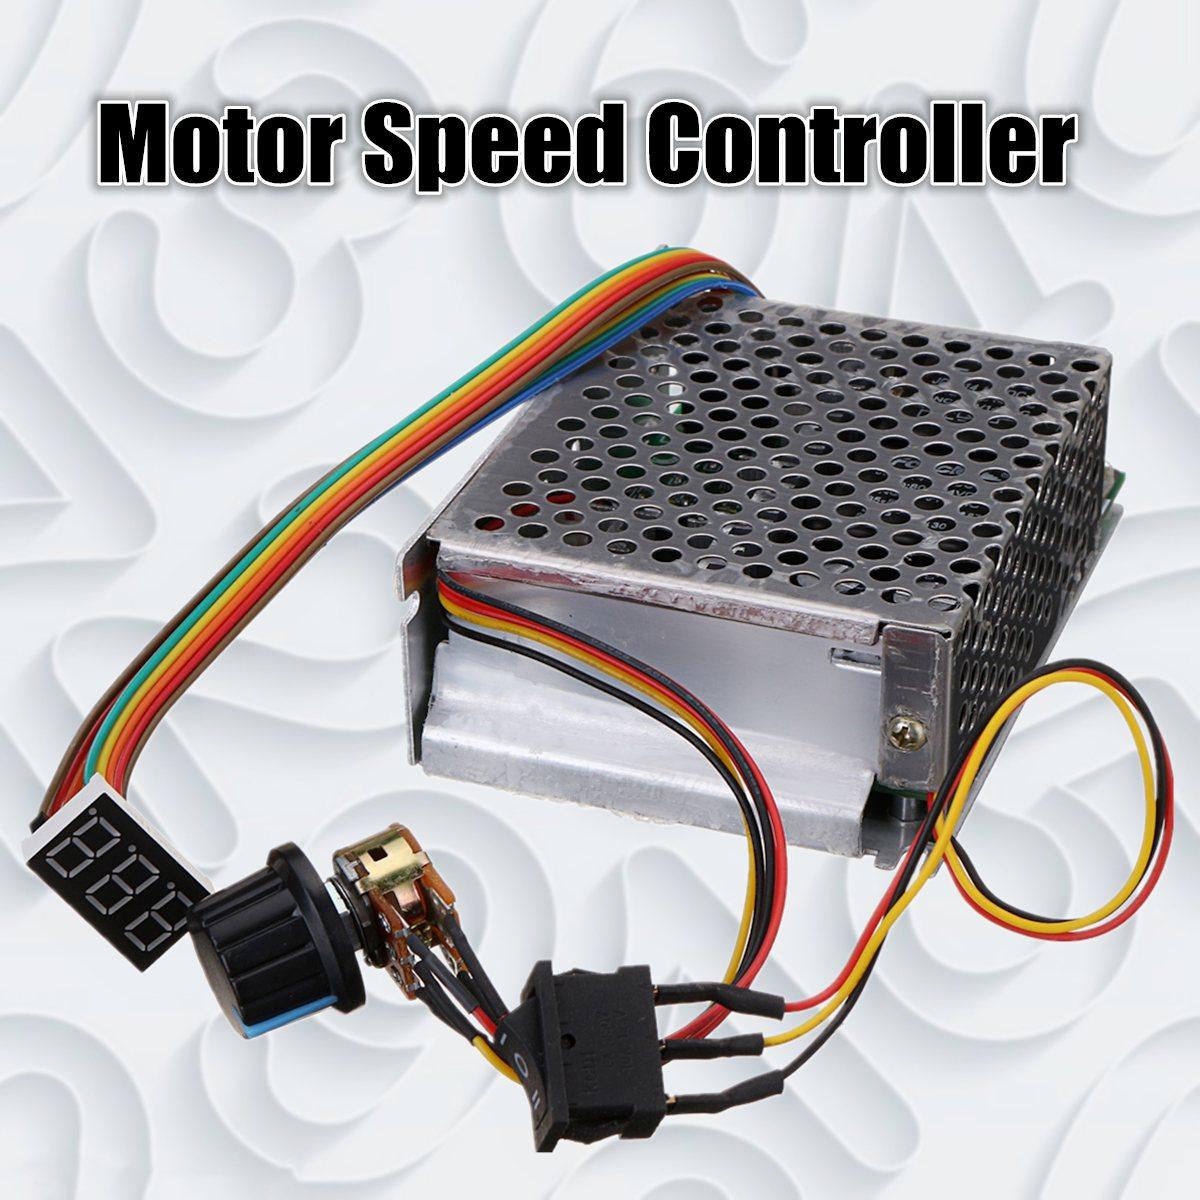 все цены на DC10-50V 60A 3000W Reversible DC Motor Speed Controller PWM Control 12V 24V 36V 48V Forward-Stop-Reversal Brake Digital Display онлайн